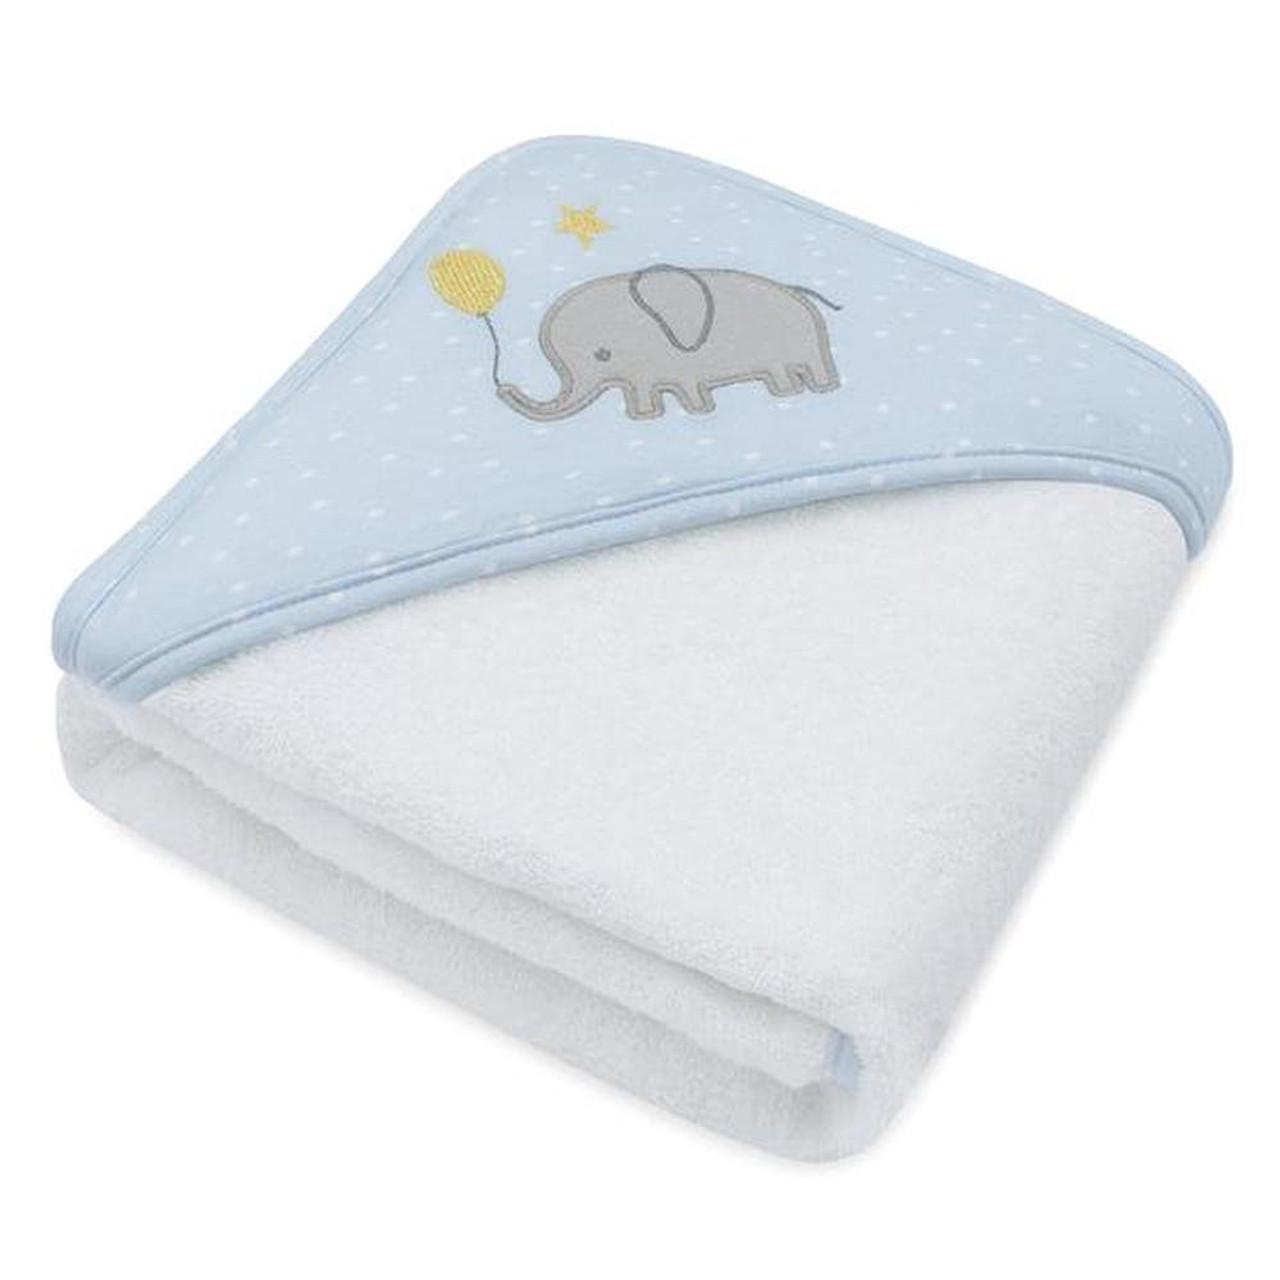 Living Textiles Hooded Towel Mason Elephant at Baby Barn Discounts